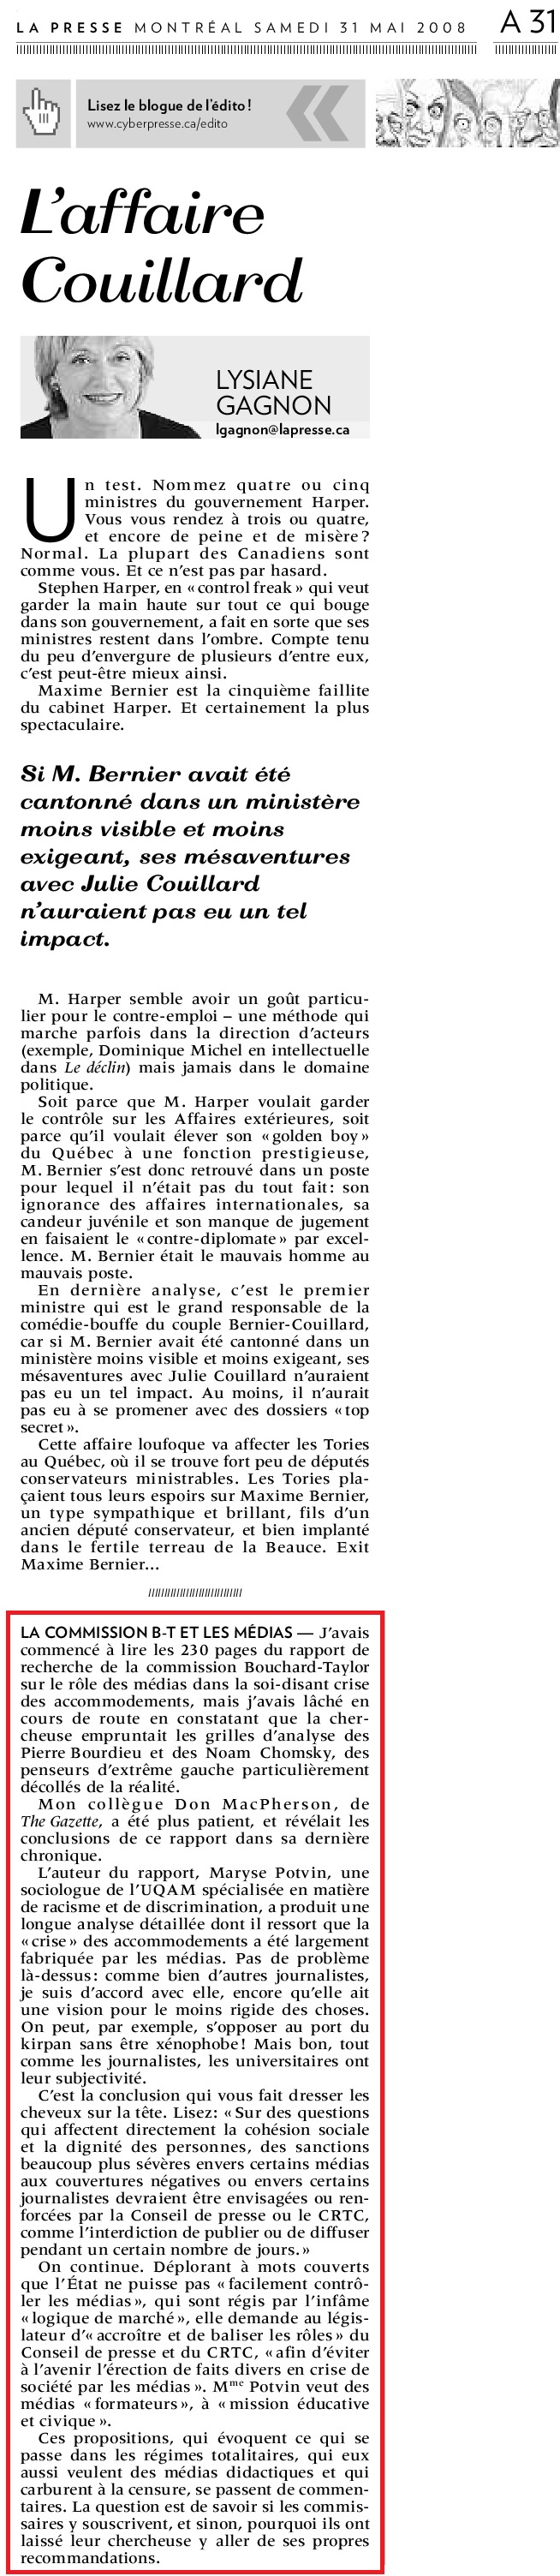 Gagnon L Maryse Potvin Censure